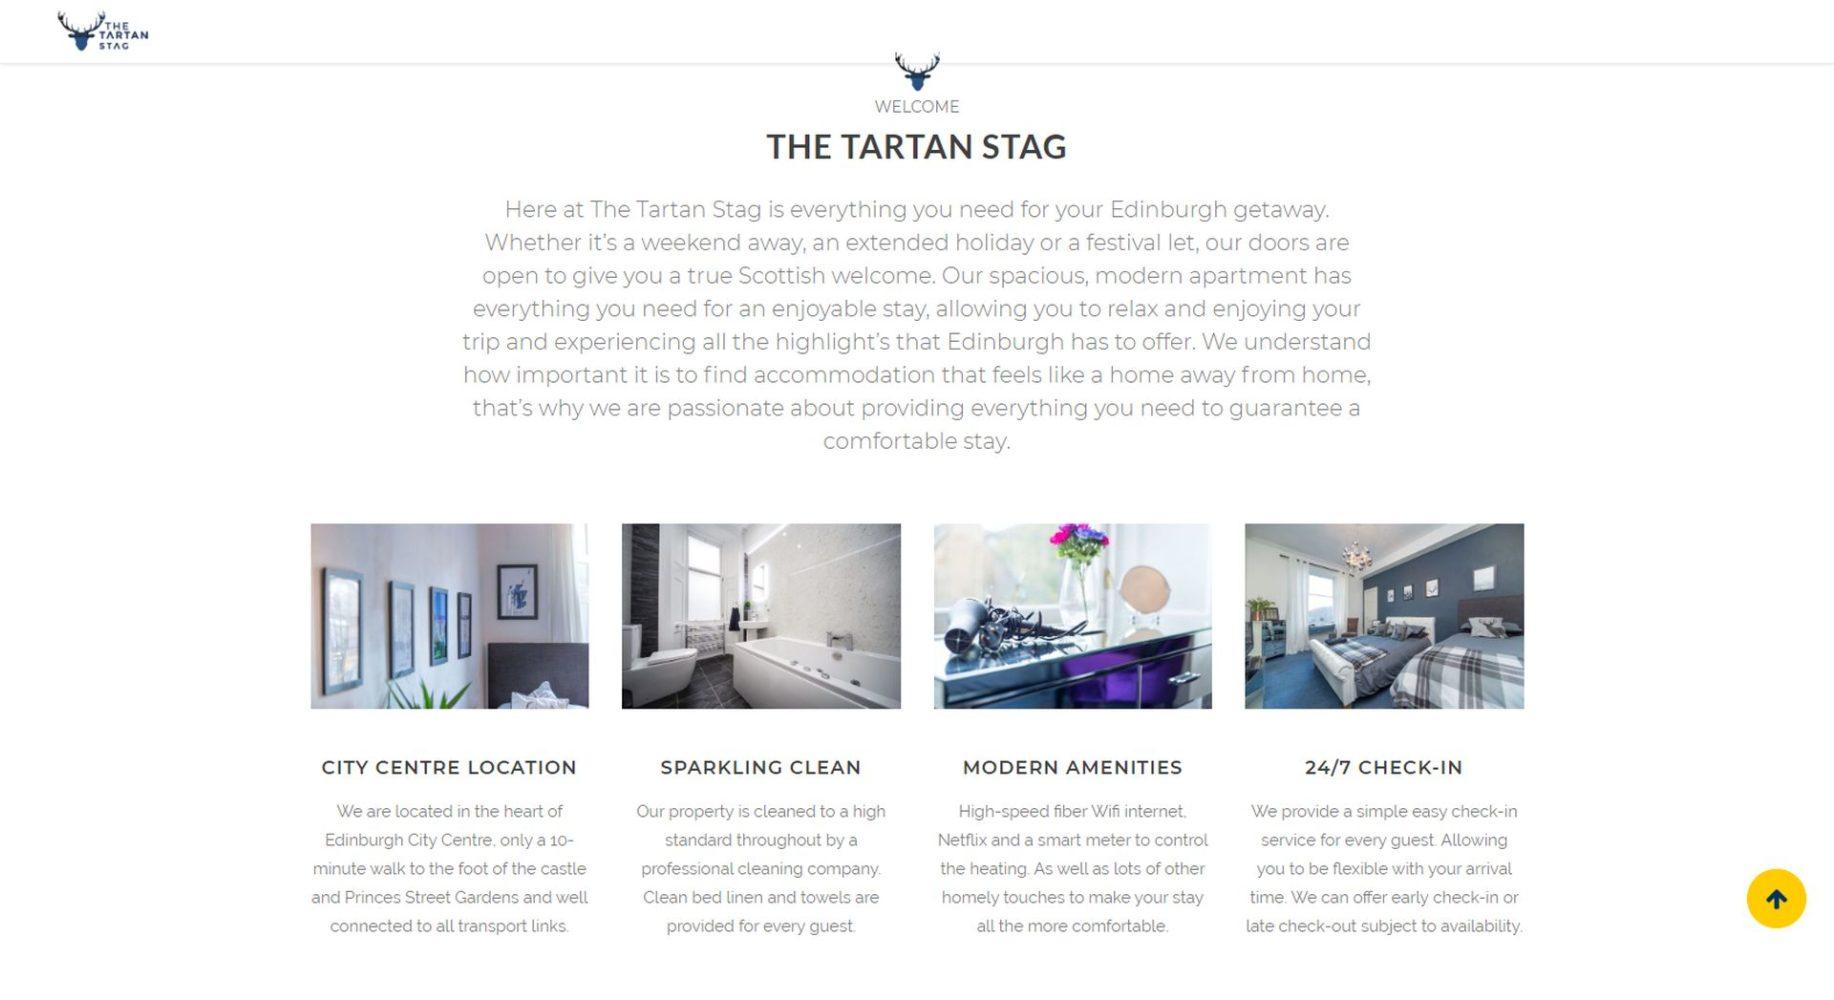 Tartan Stag Website Design About